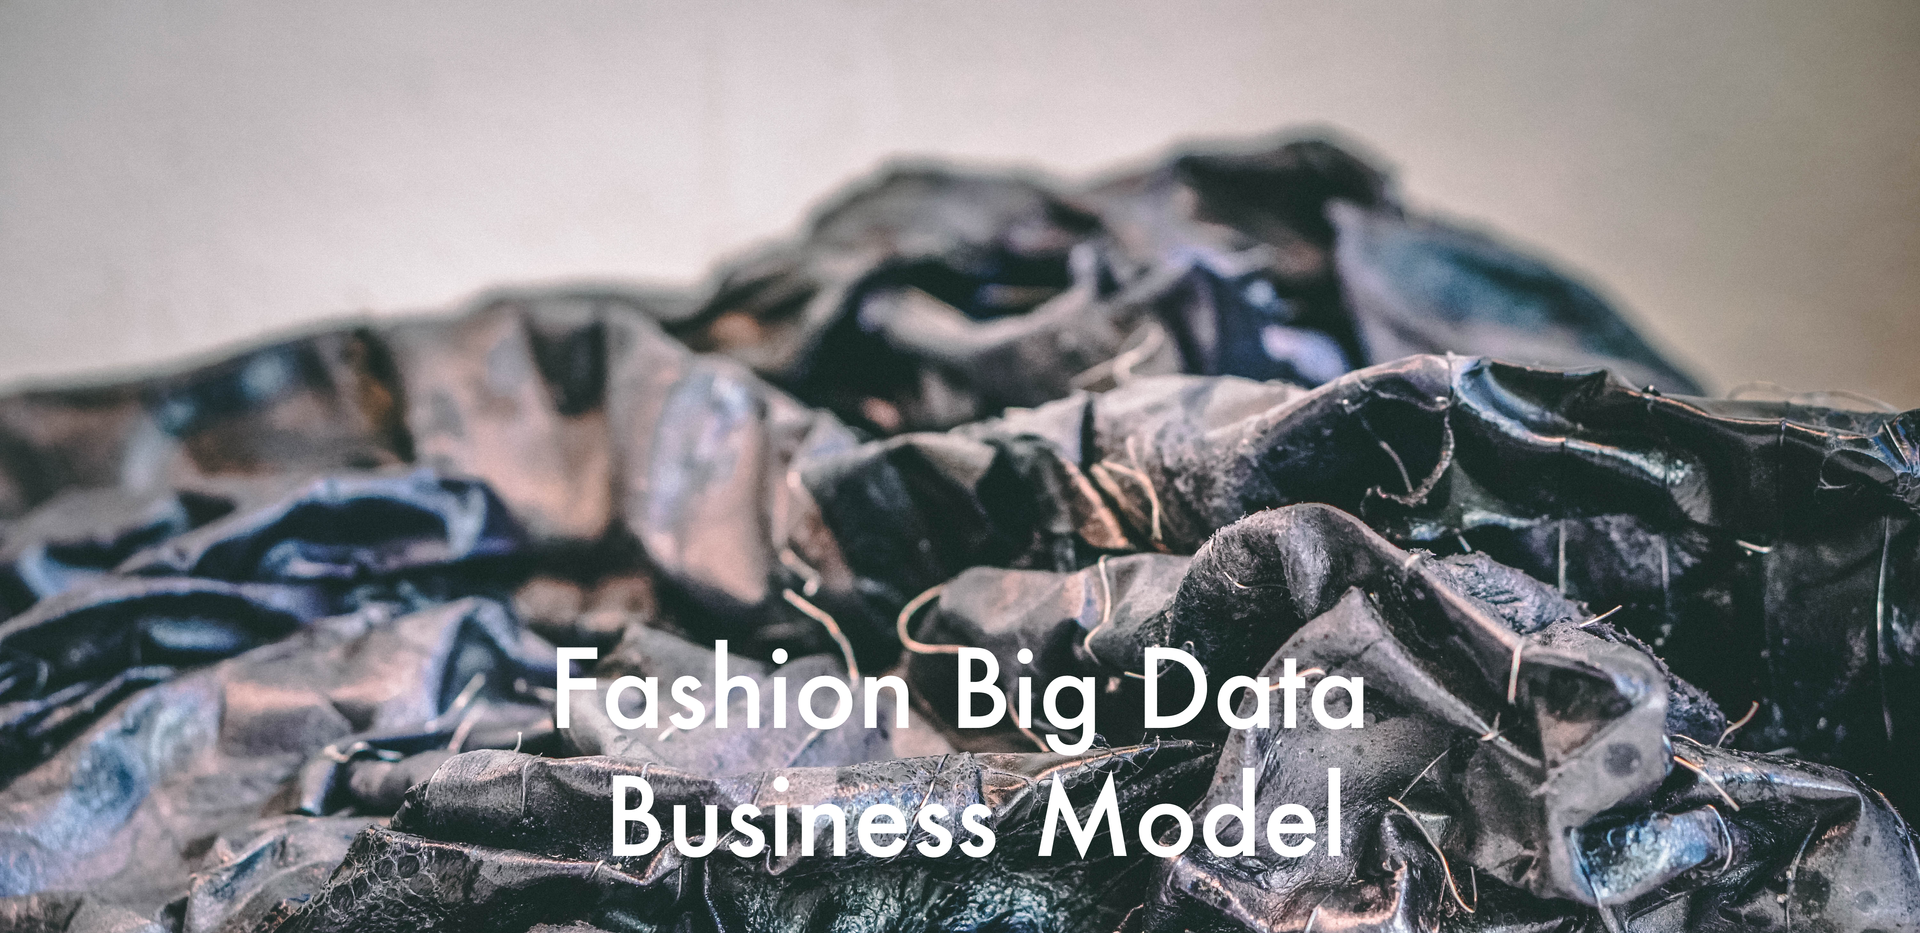 Fashion Big Data Business Model